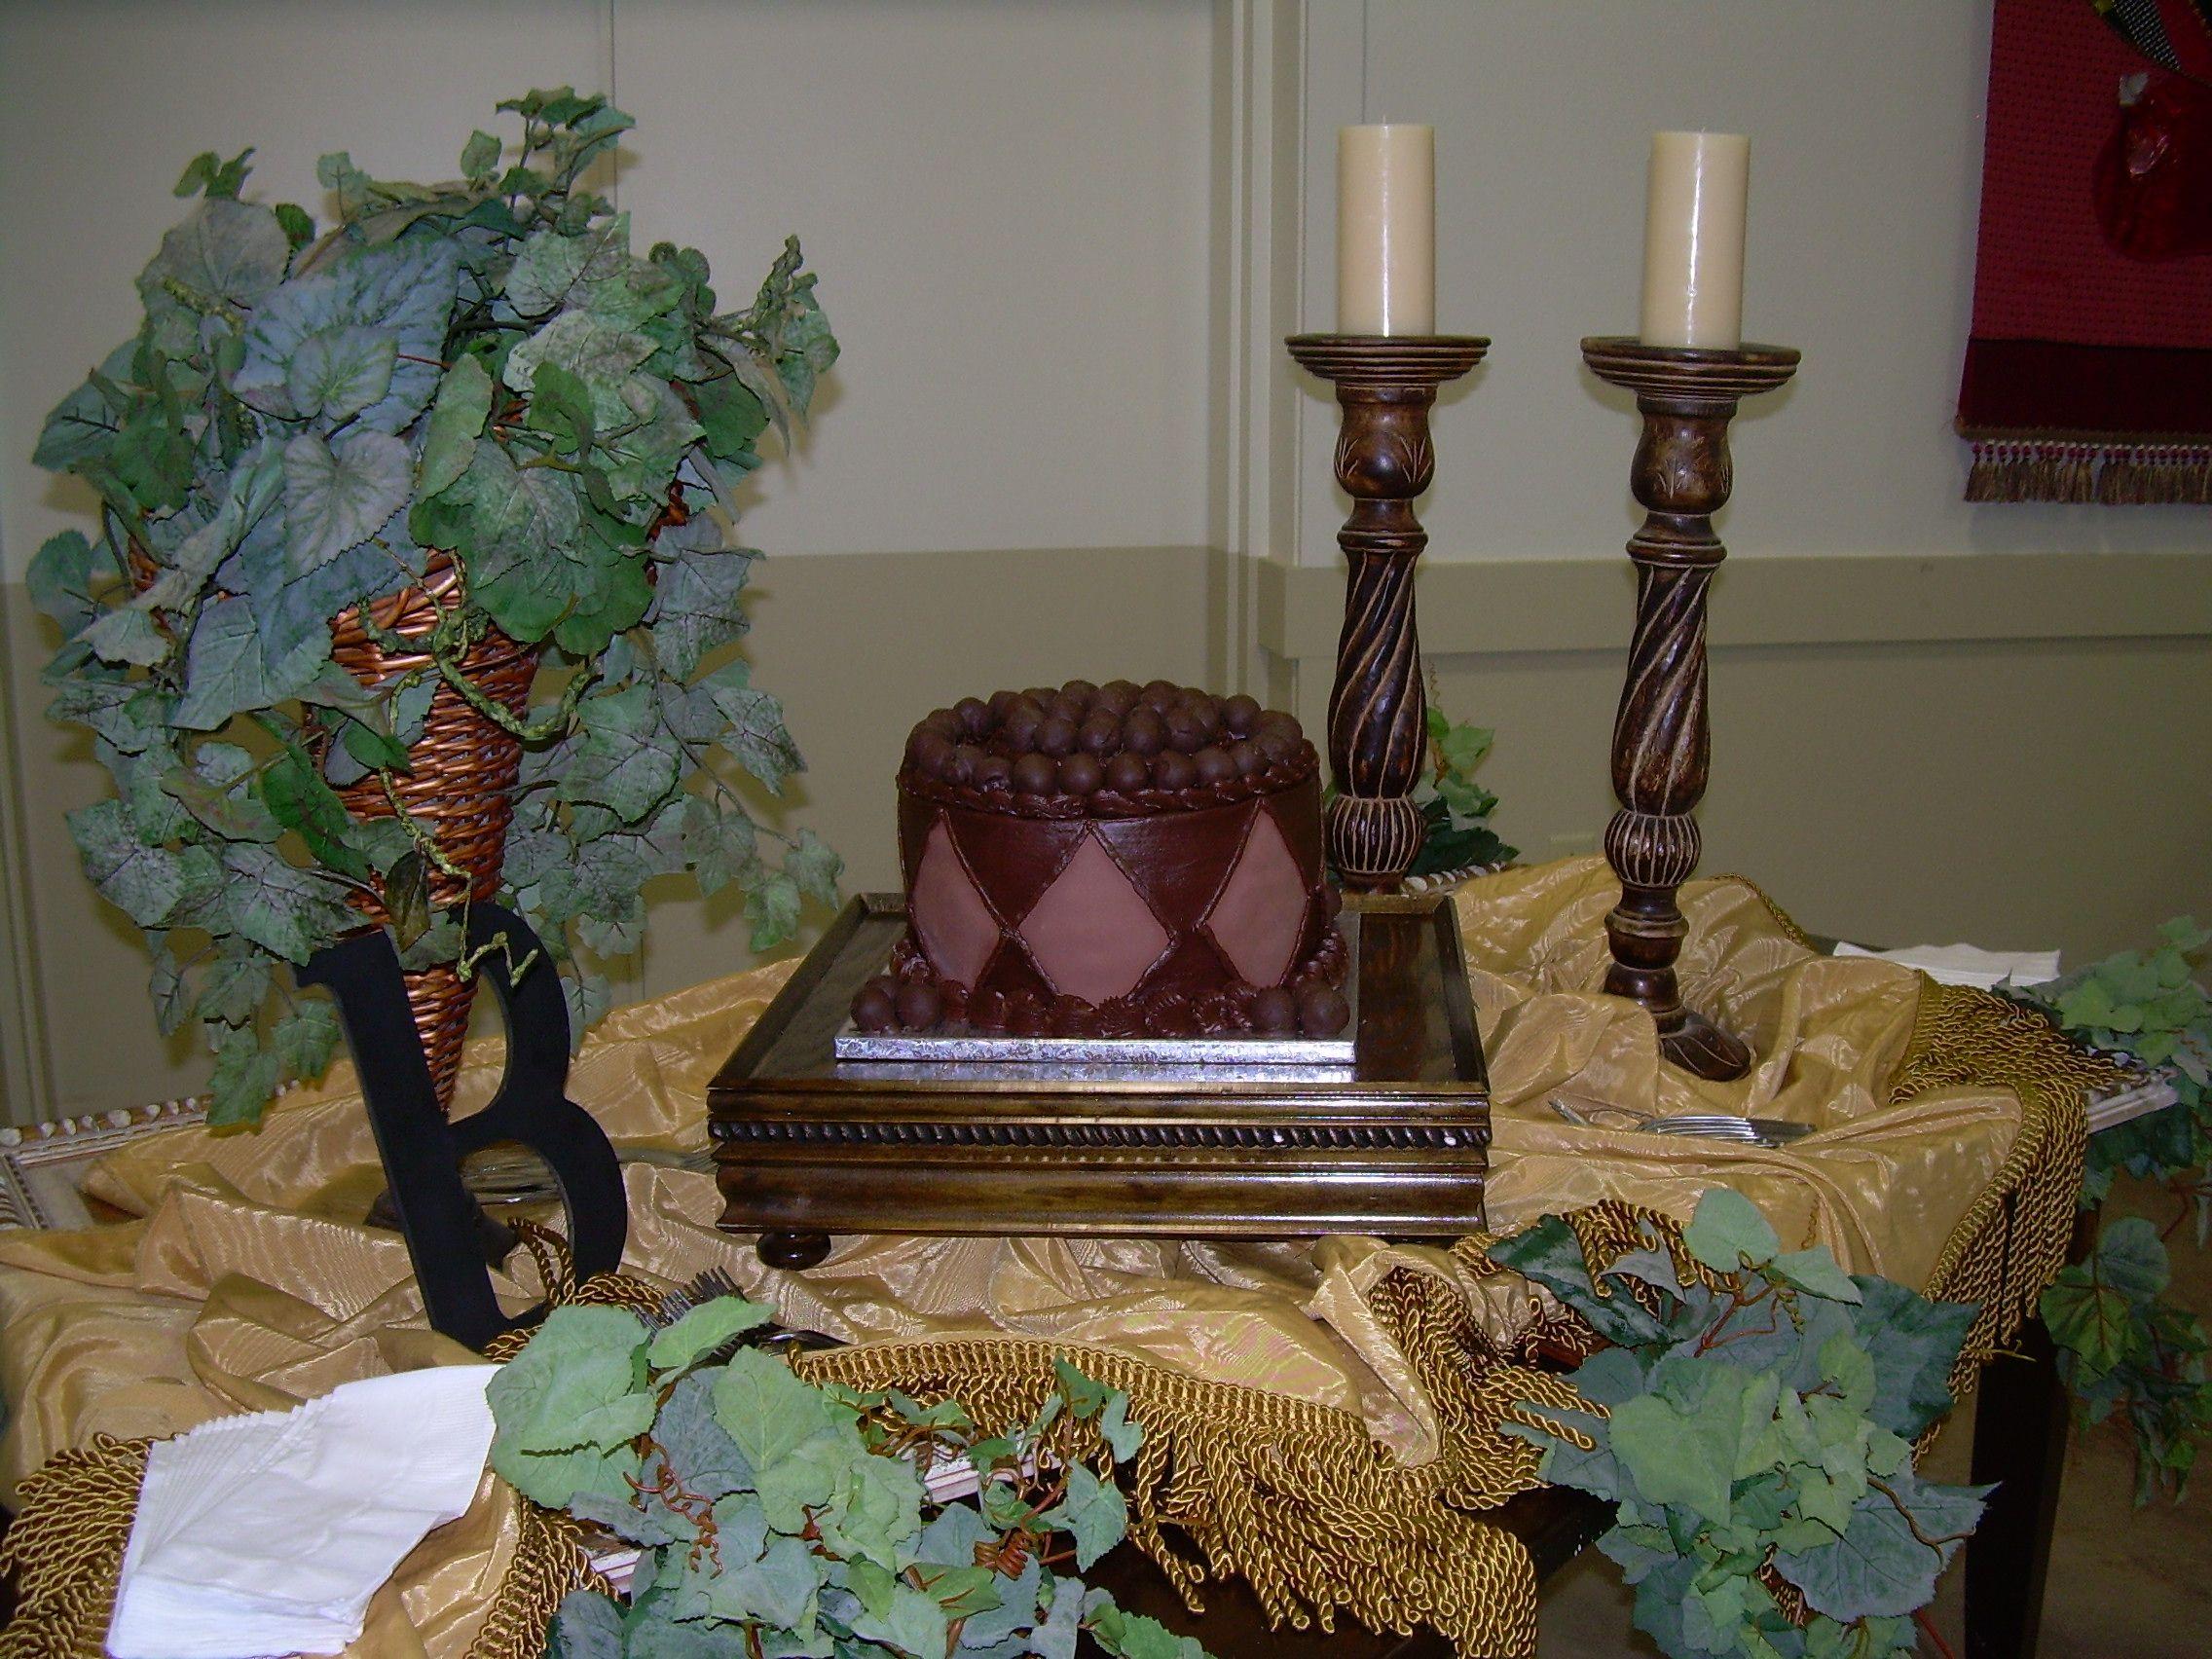 Bride Groom Wedding Table Ideas : Grooms table wedding ideas